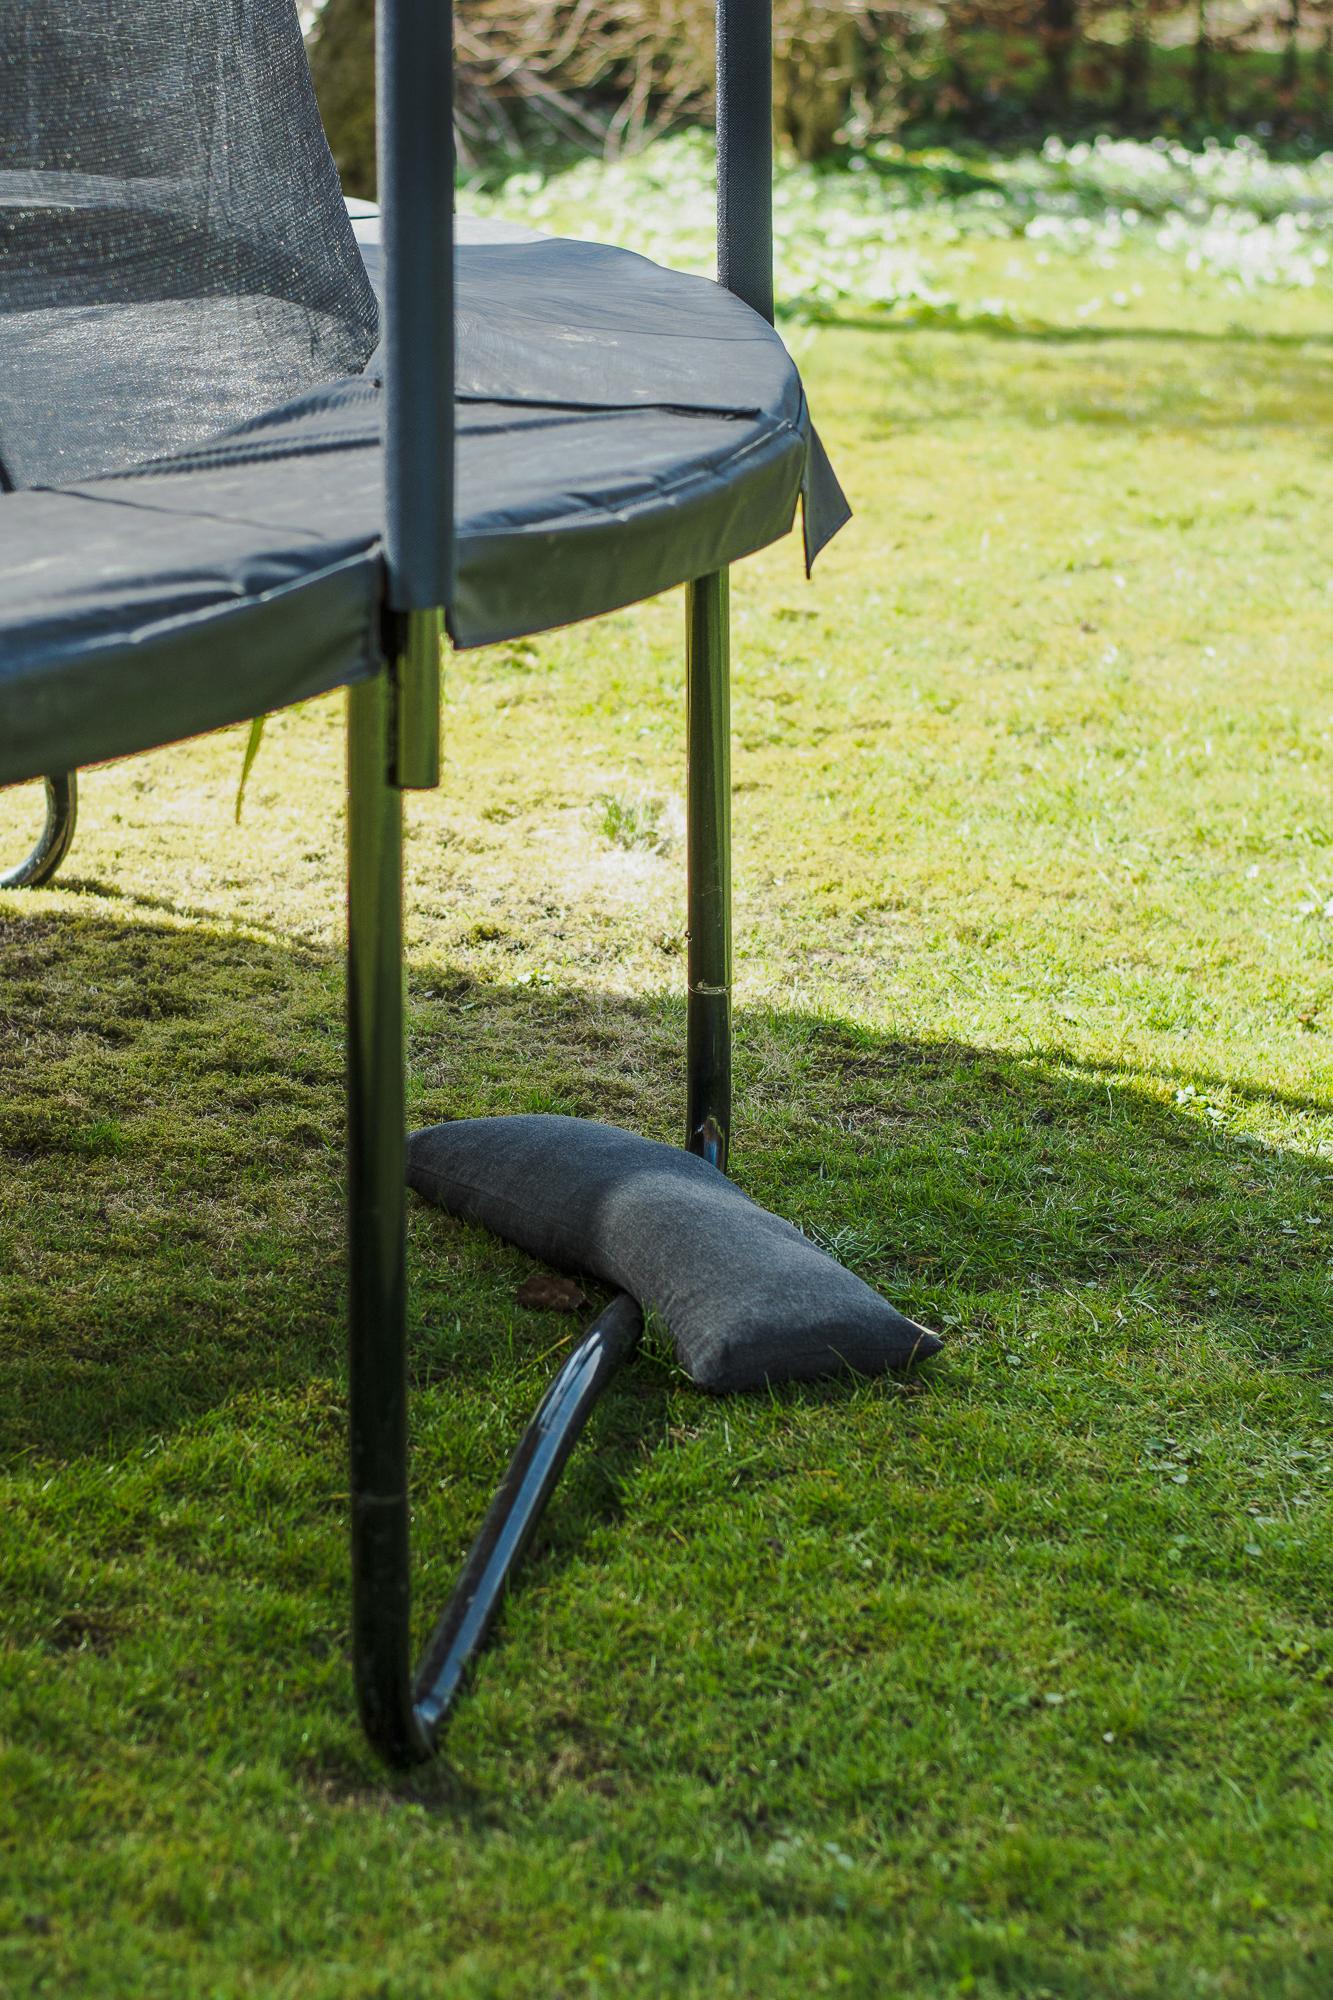 Baser Outdoor Sandsäcke 2 Stck à 15kg 70x23cm dunkelgrau Bild 4